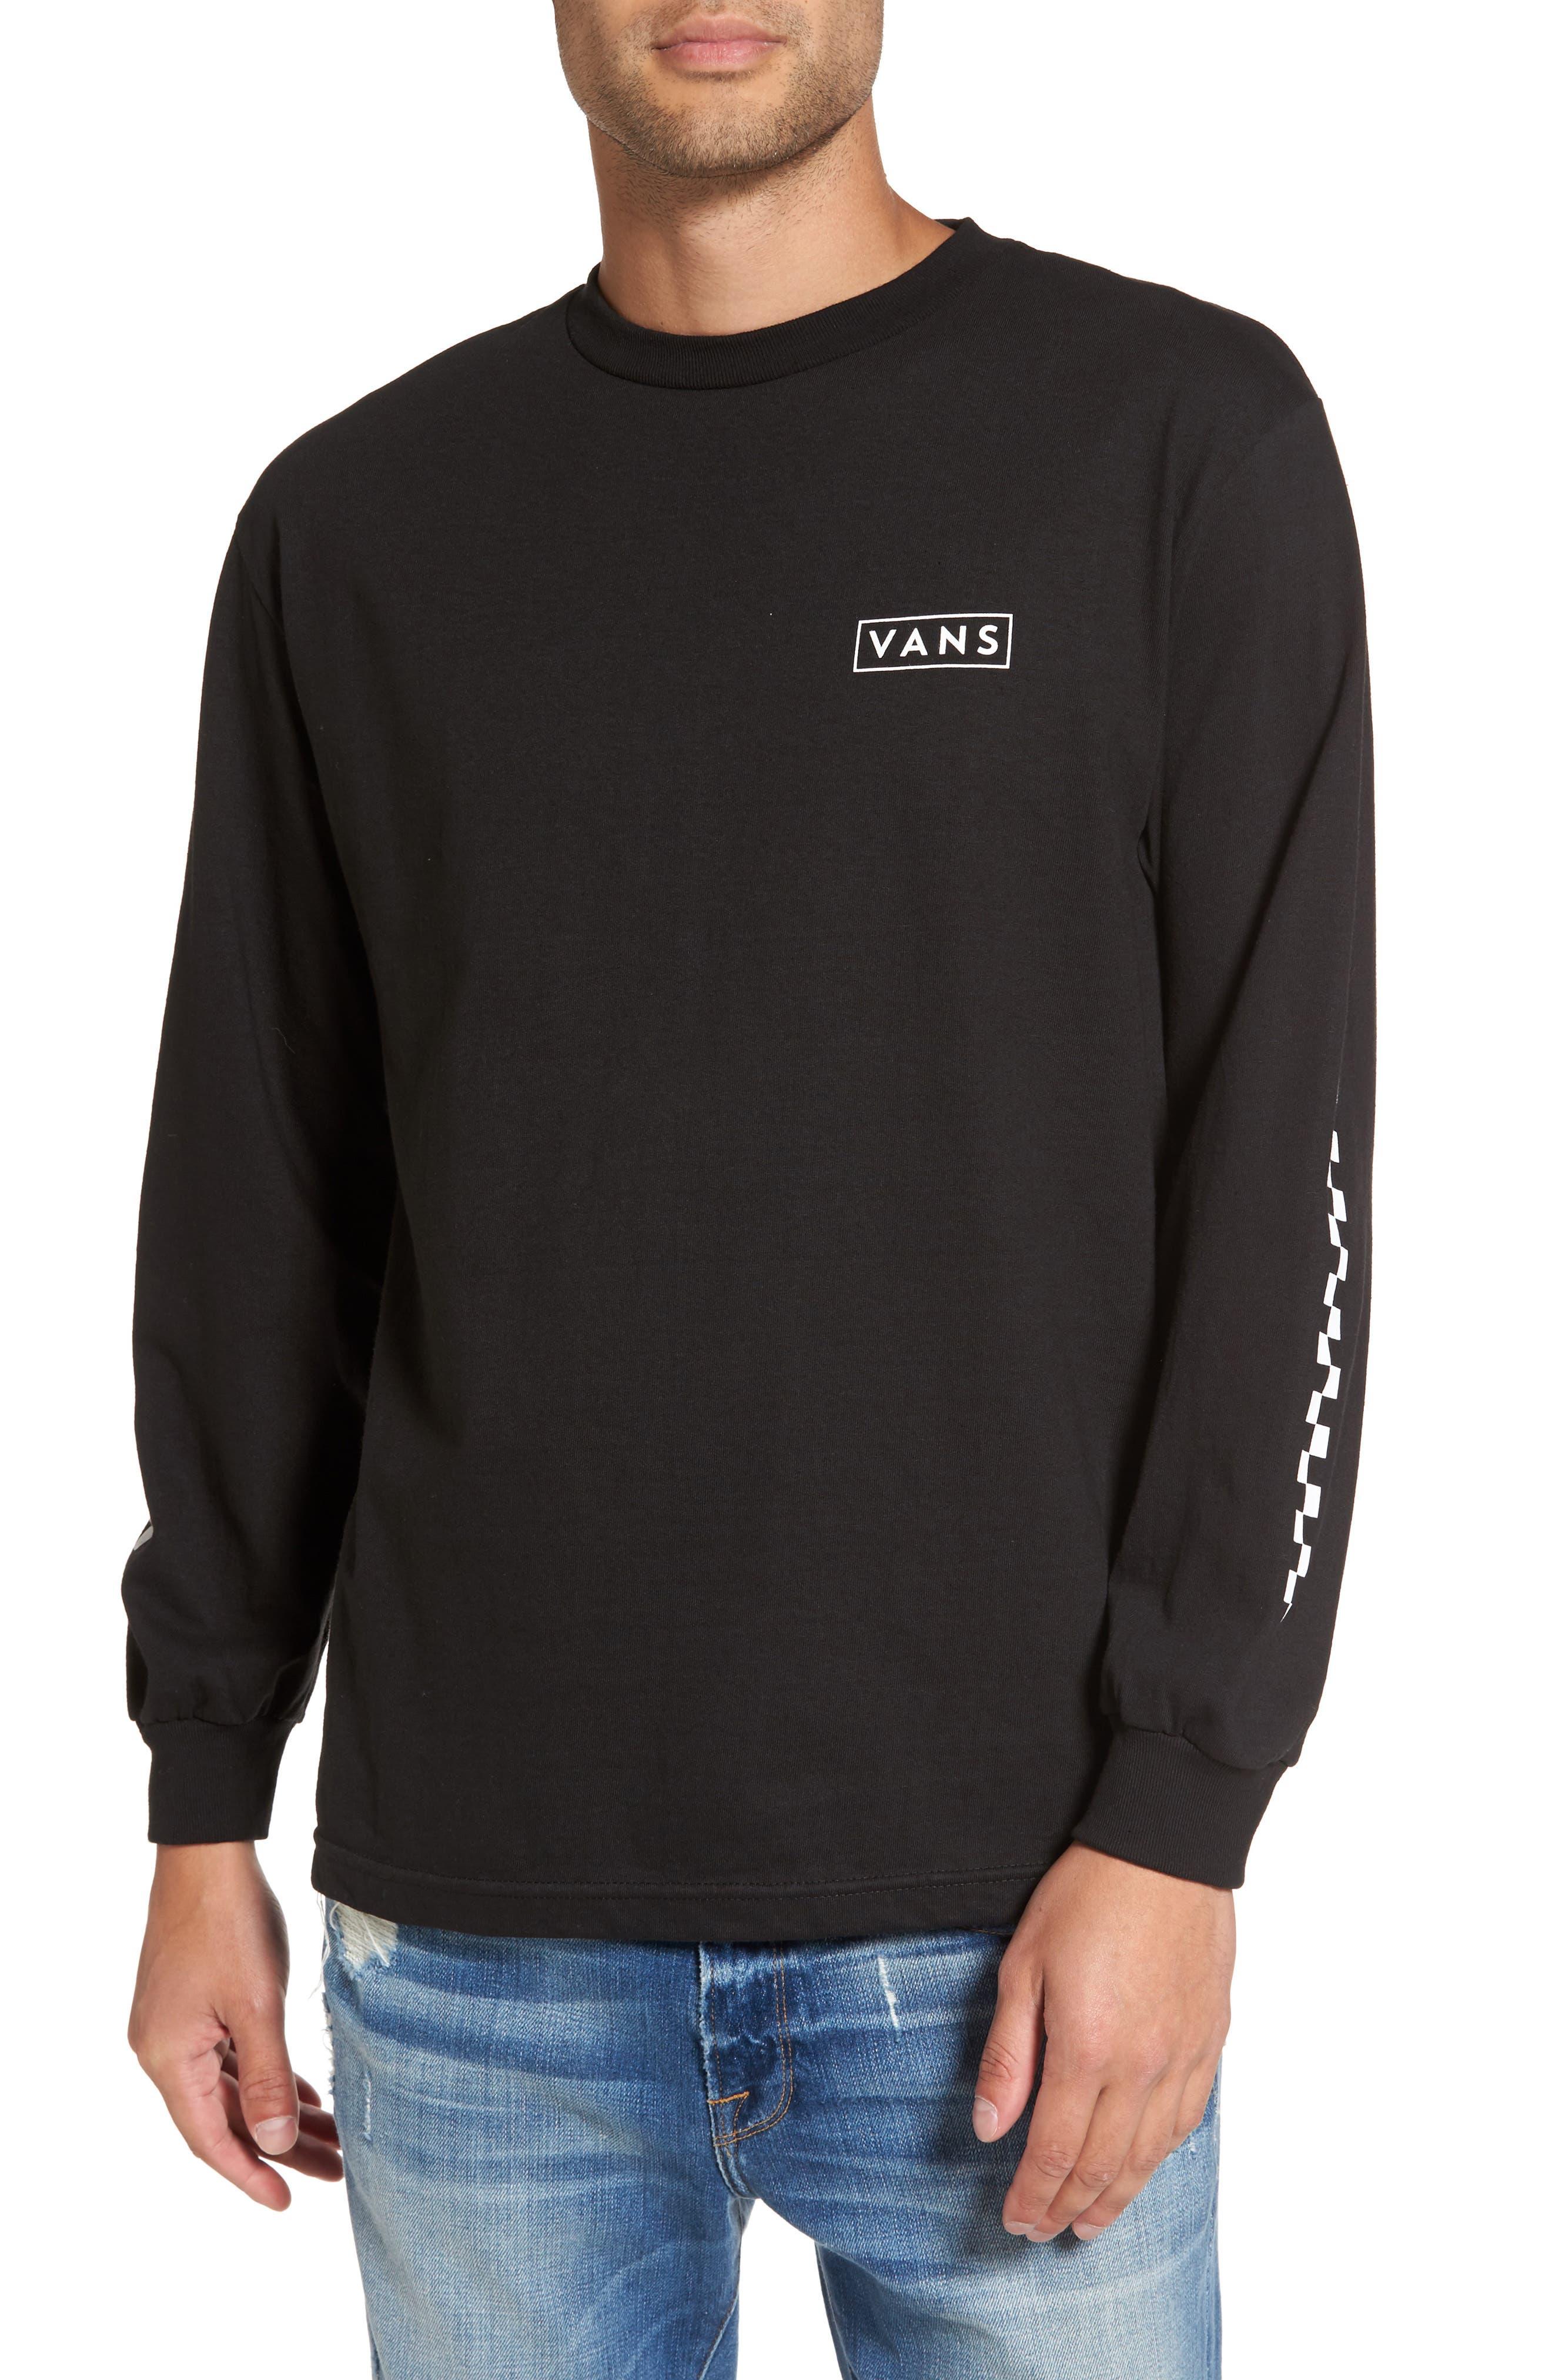 Main Image - Vans Checkmate Long Sleeve Graphic T-Shirt